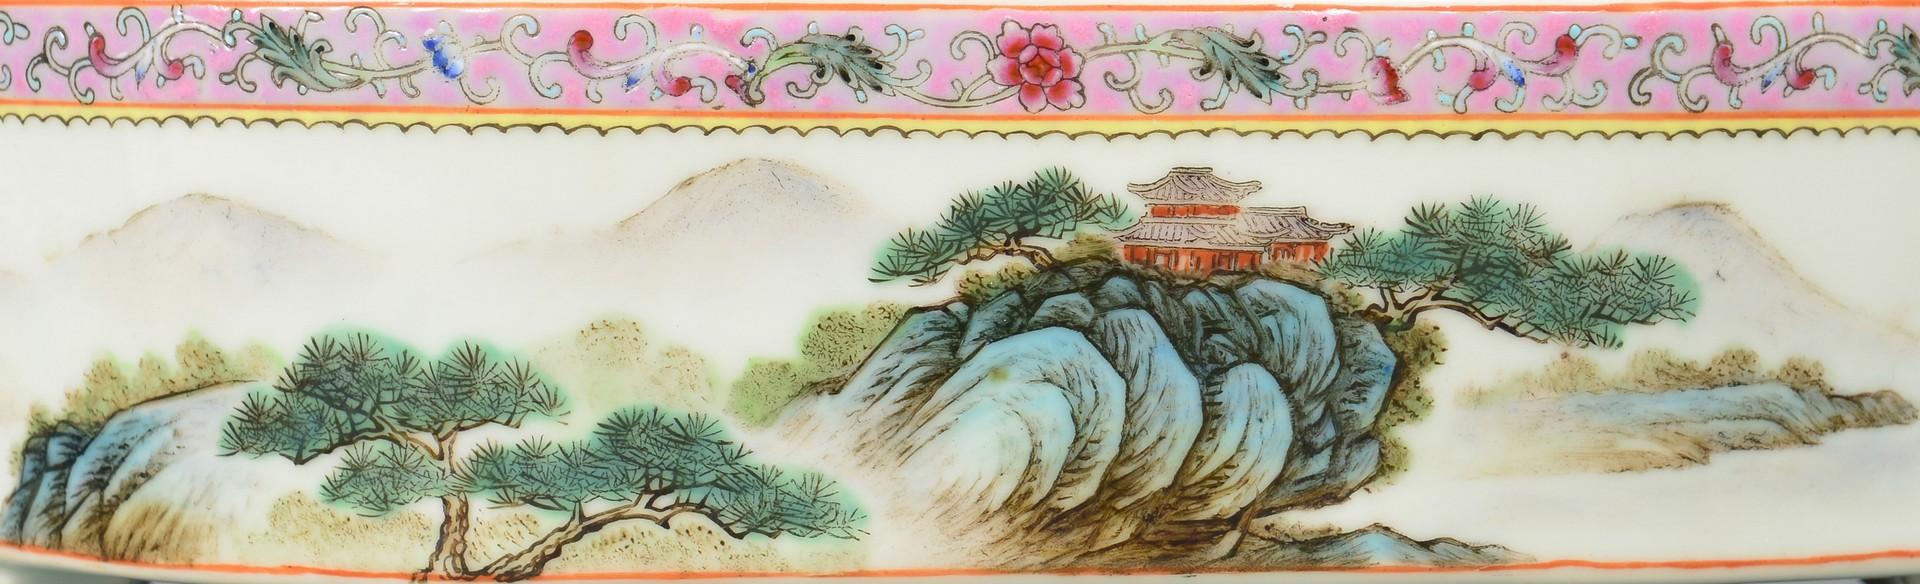 Lot 4010219: Chinese Republic Porcelain Bulb Bowl